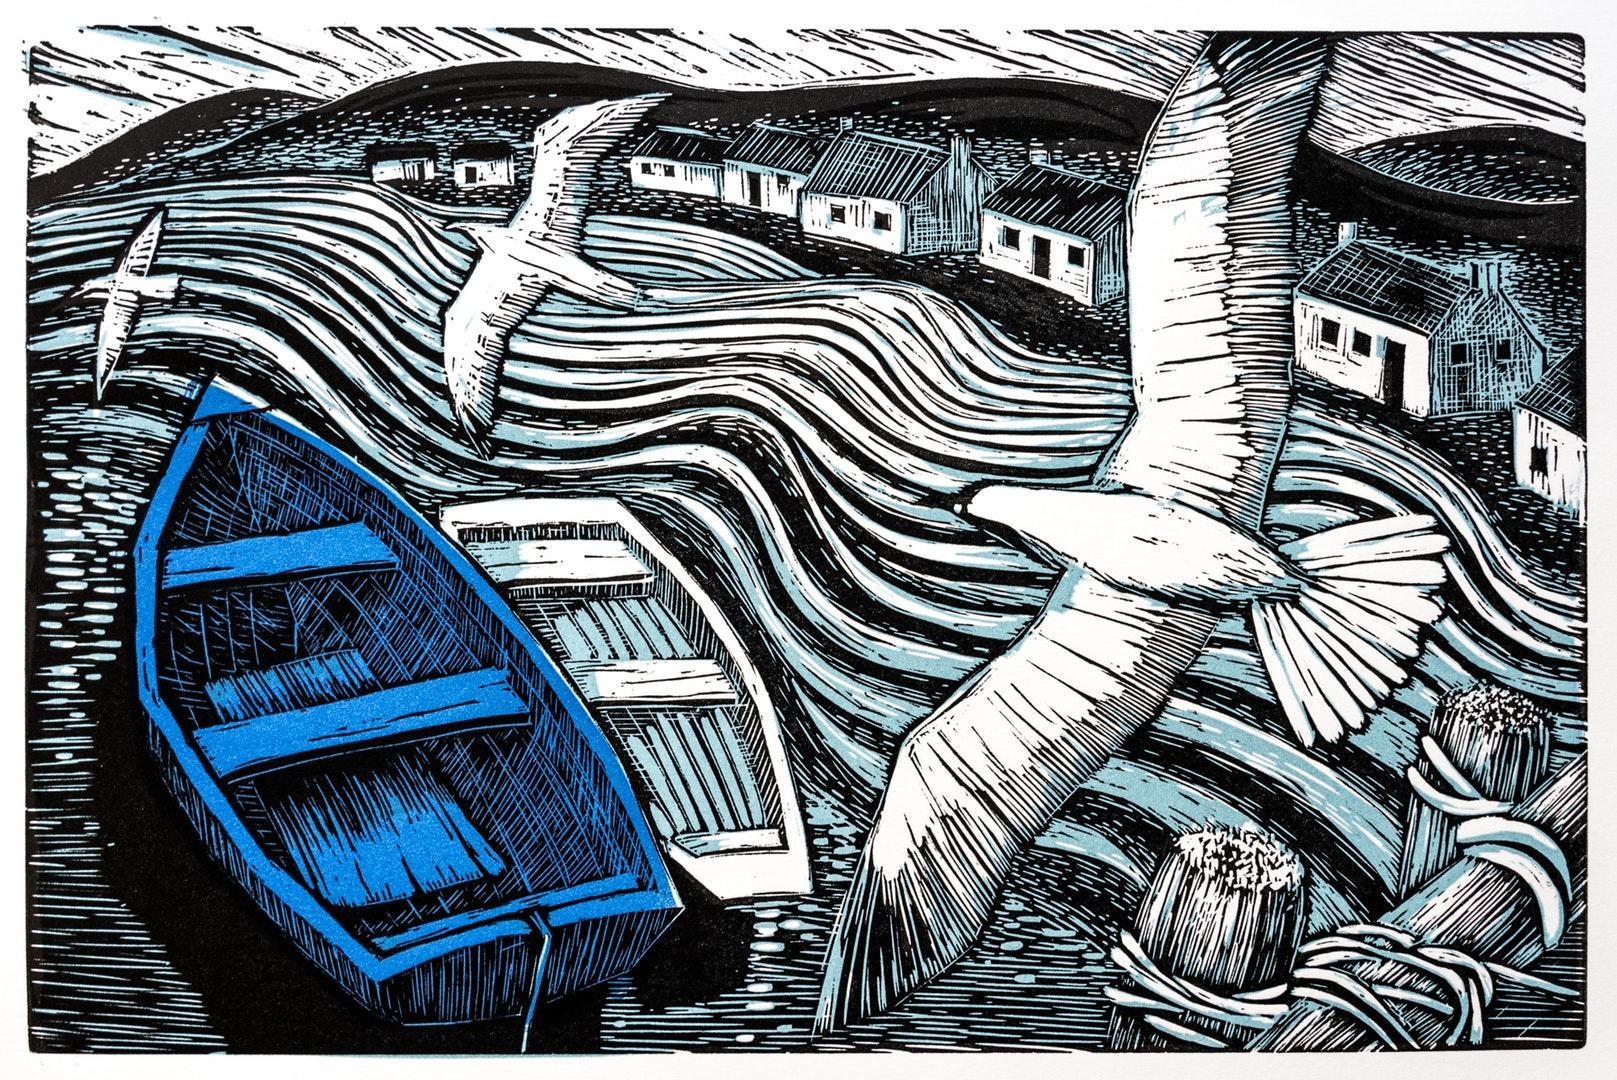 Aga Karmol  Blue Boat  Linocut (3 plates) printed on paper, 20 x 30 cm  http://www.agakarmol.net